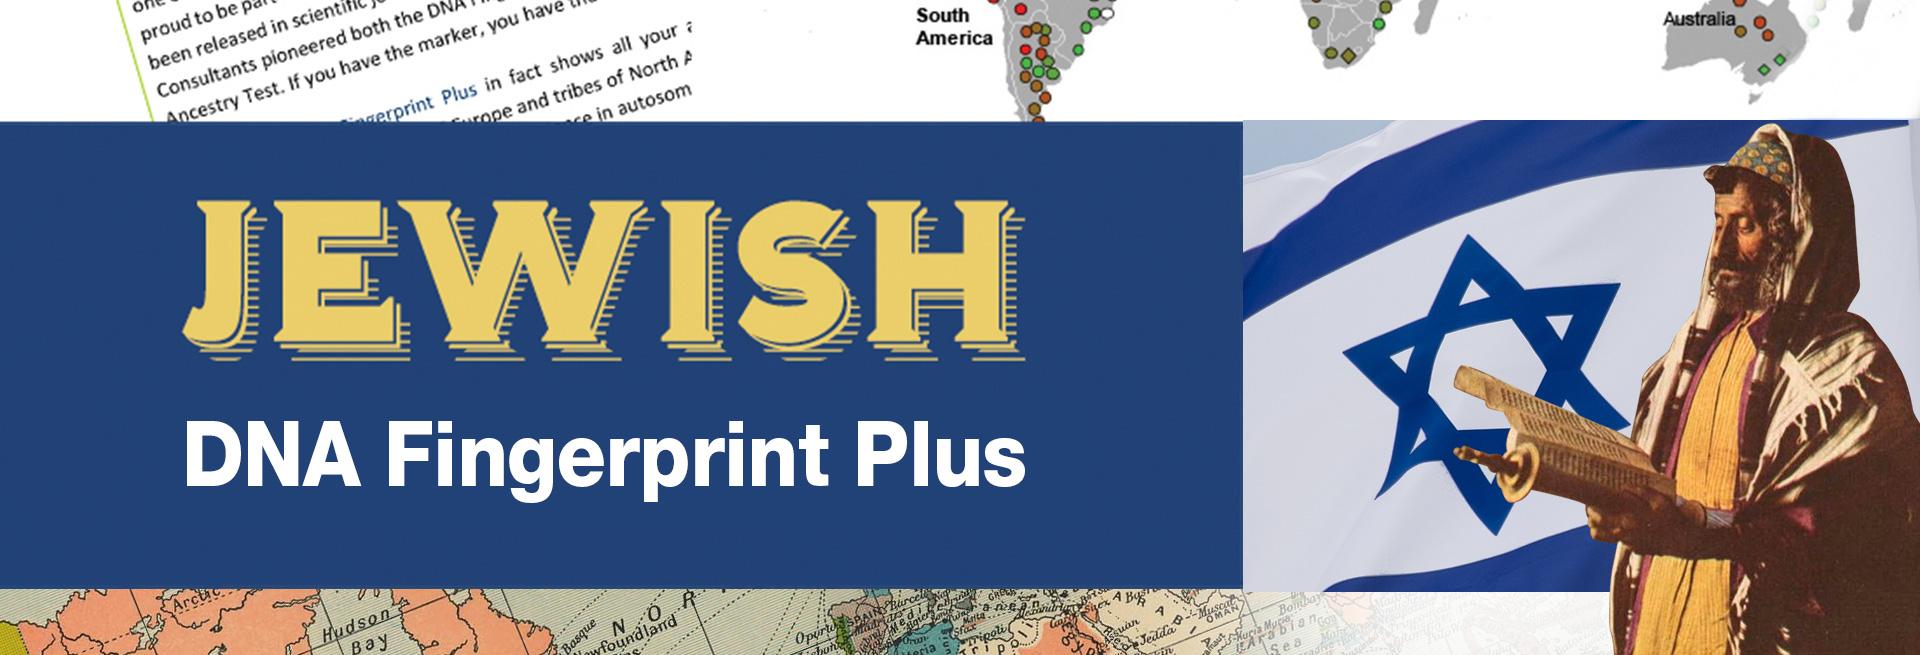 Jewish DNA Fingerprint Plus Test